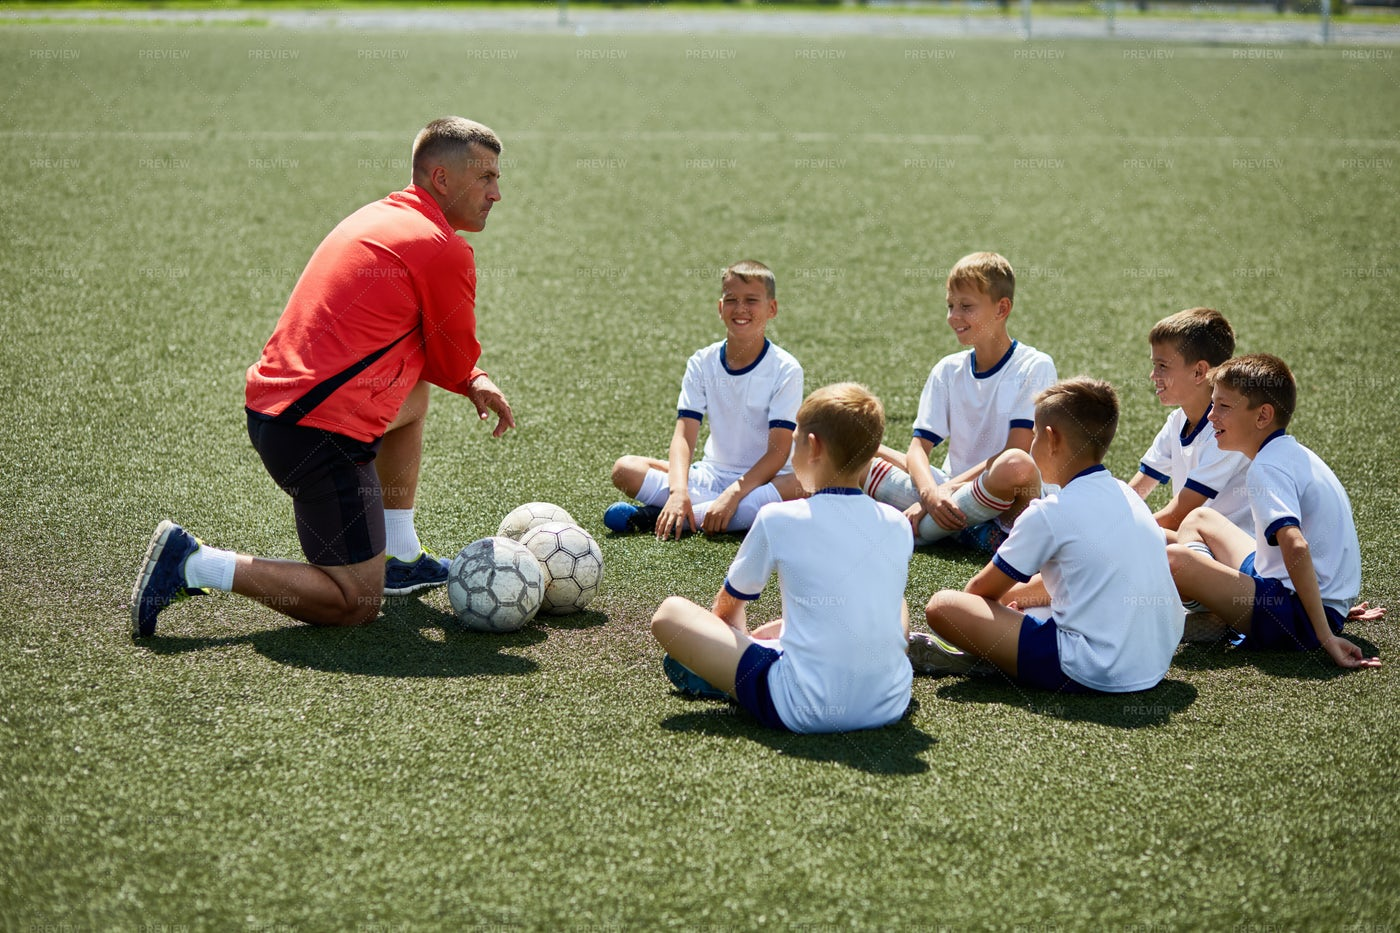 Coach Instructing Junior Football...: Stock Photos